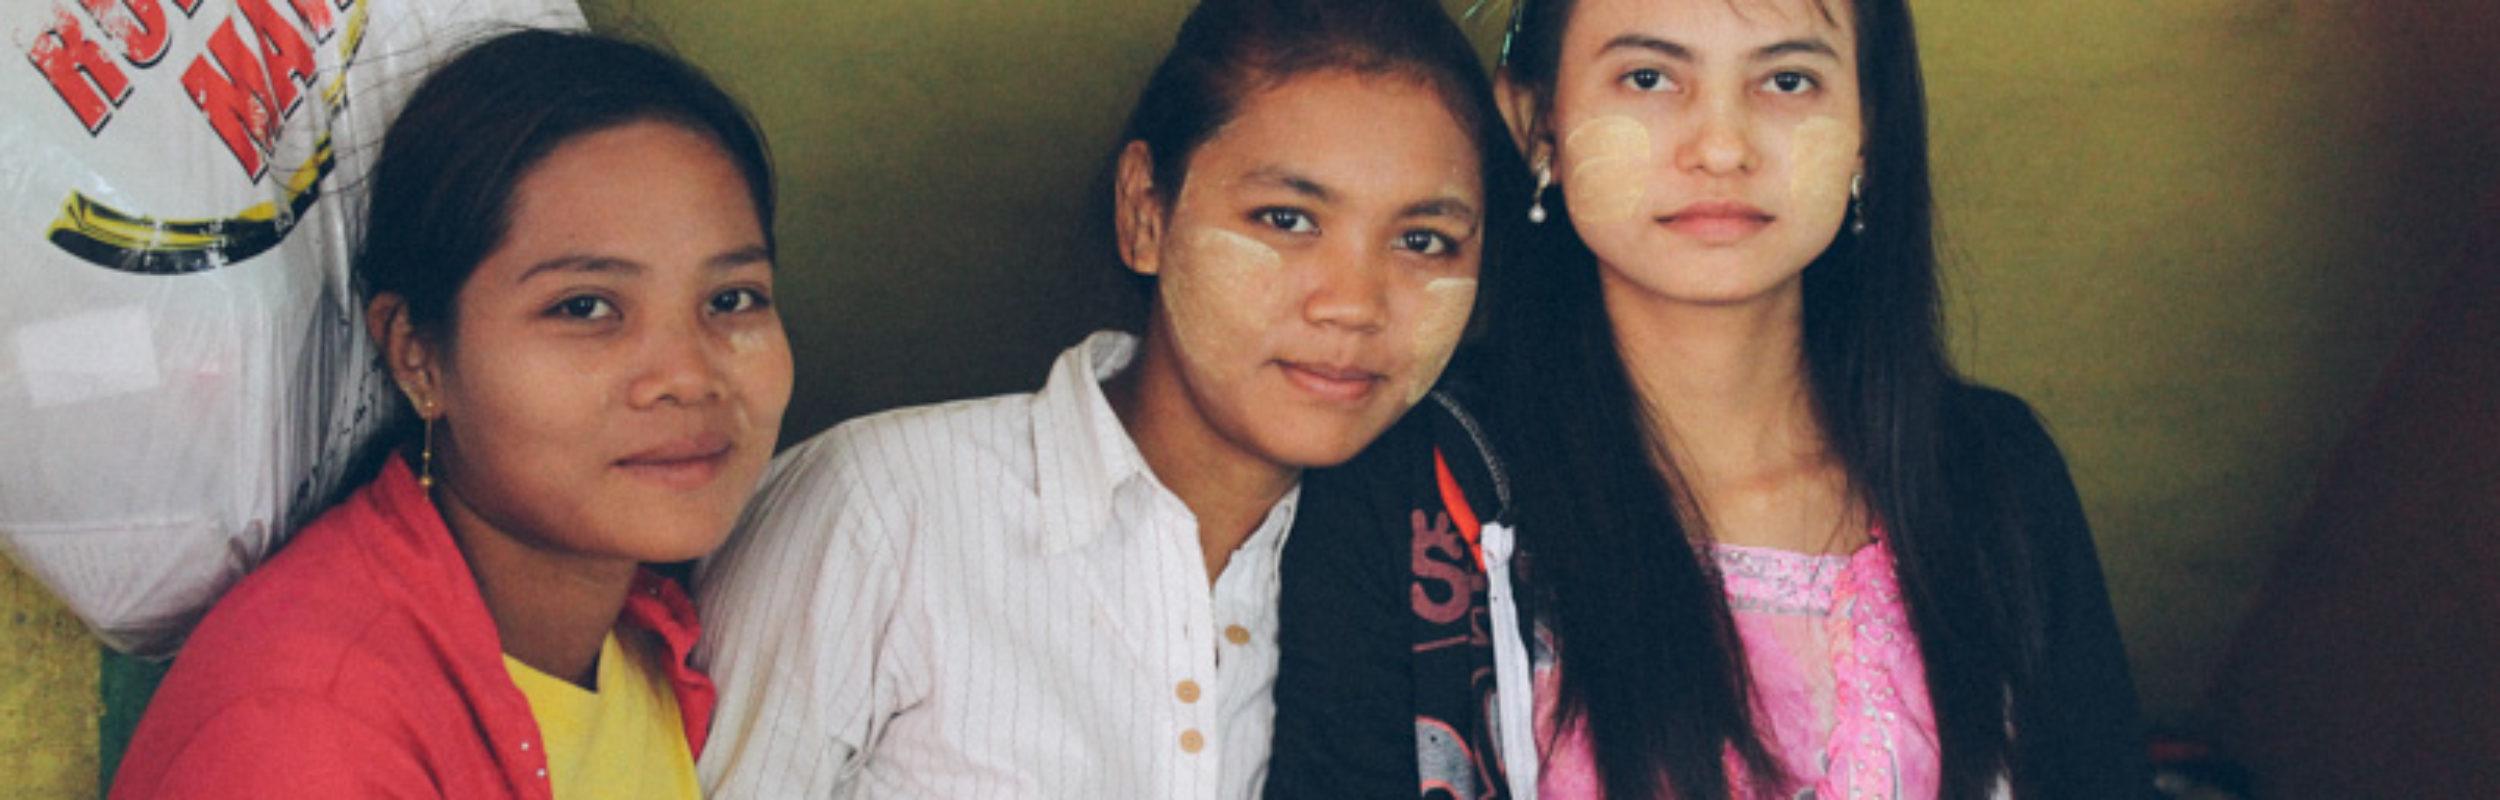 Birmanie : 10 trucs insolites à savoir